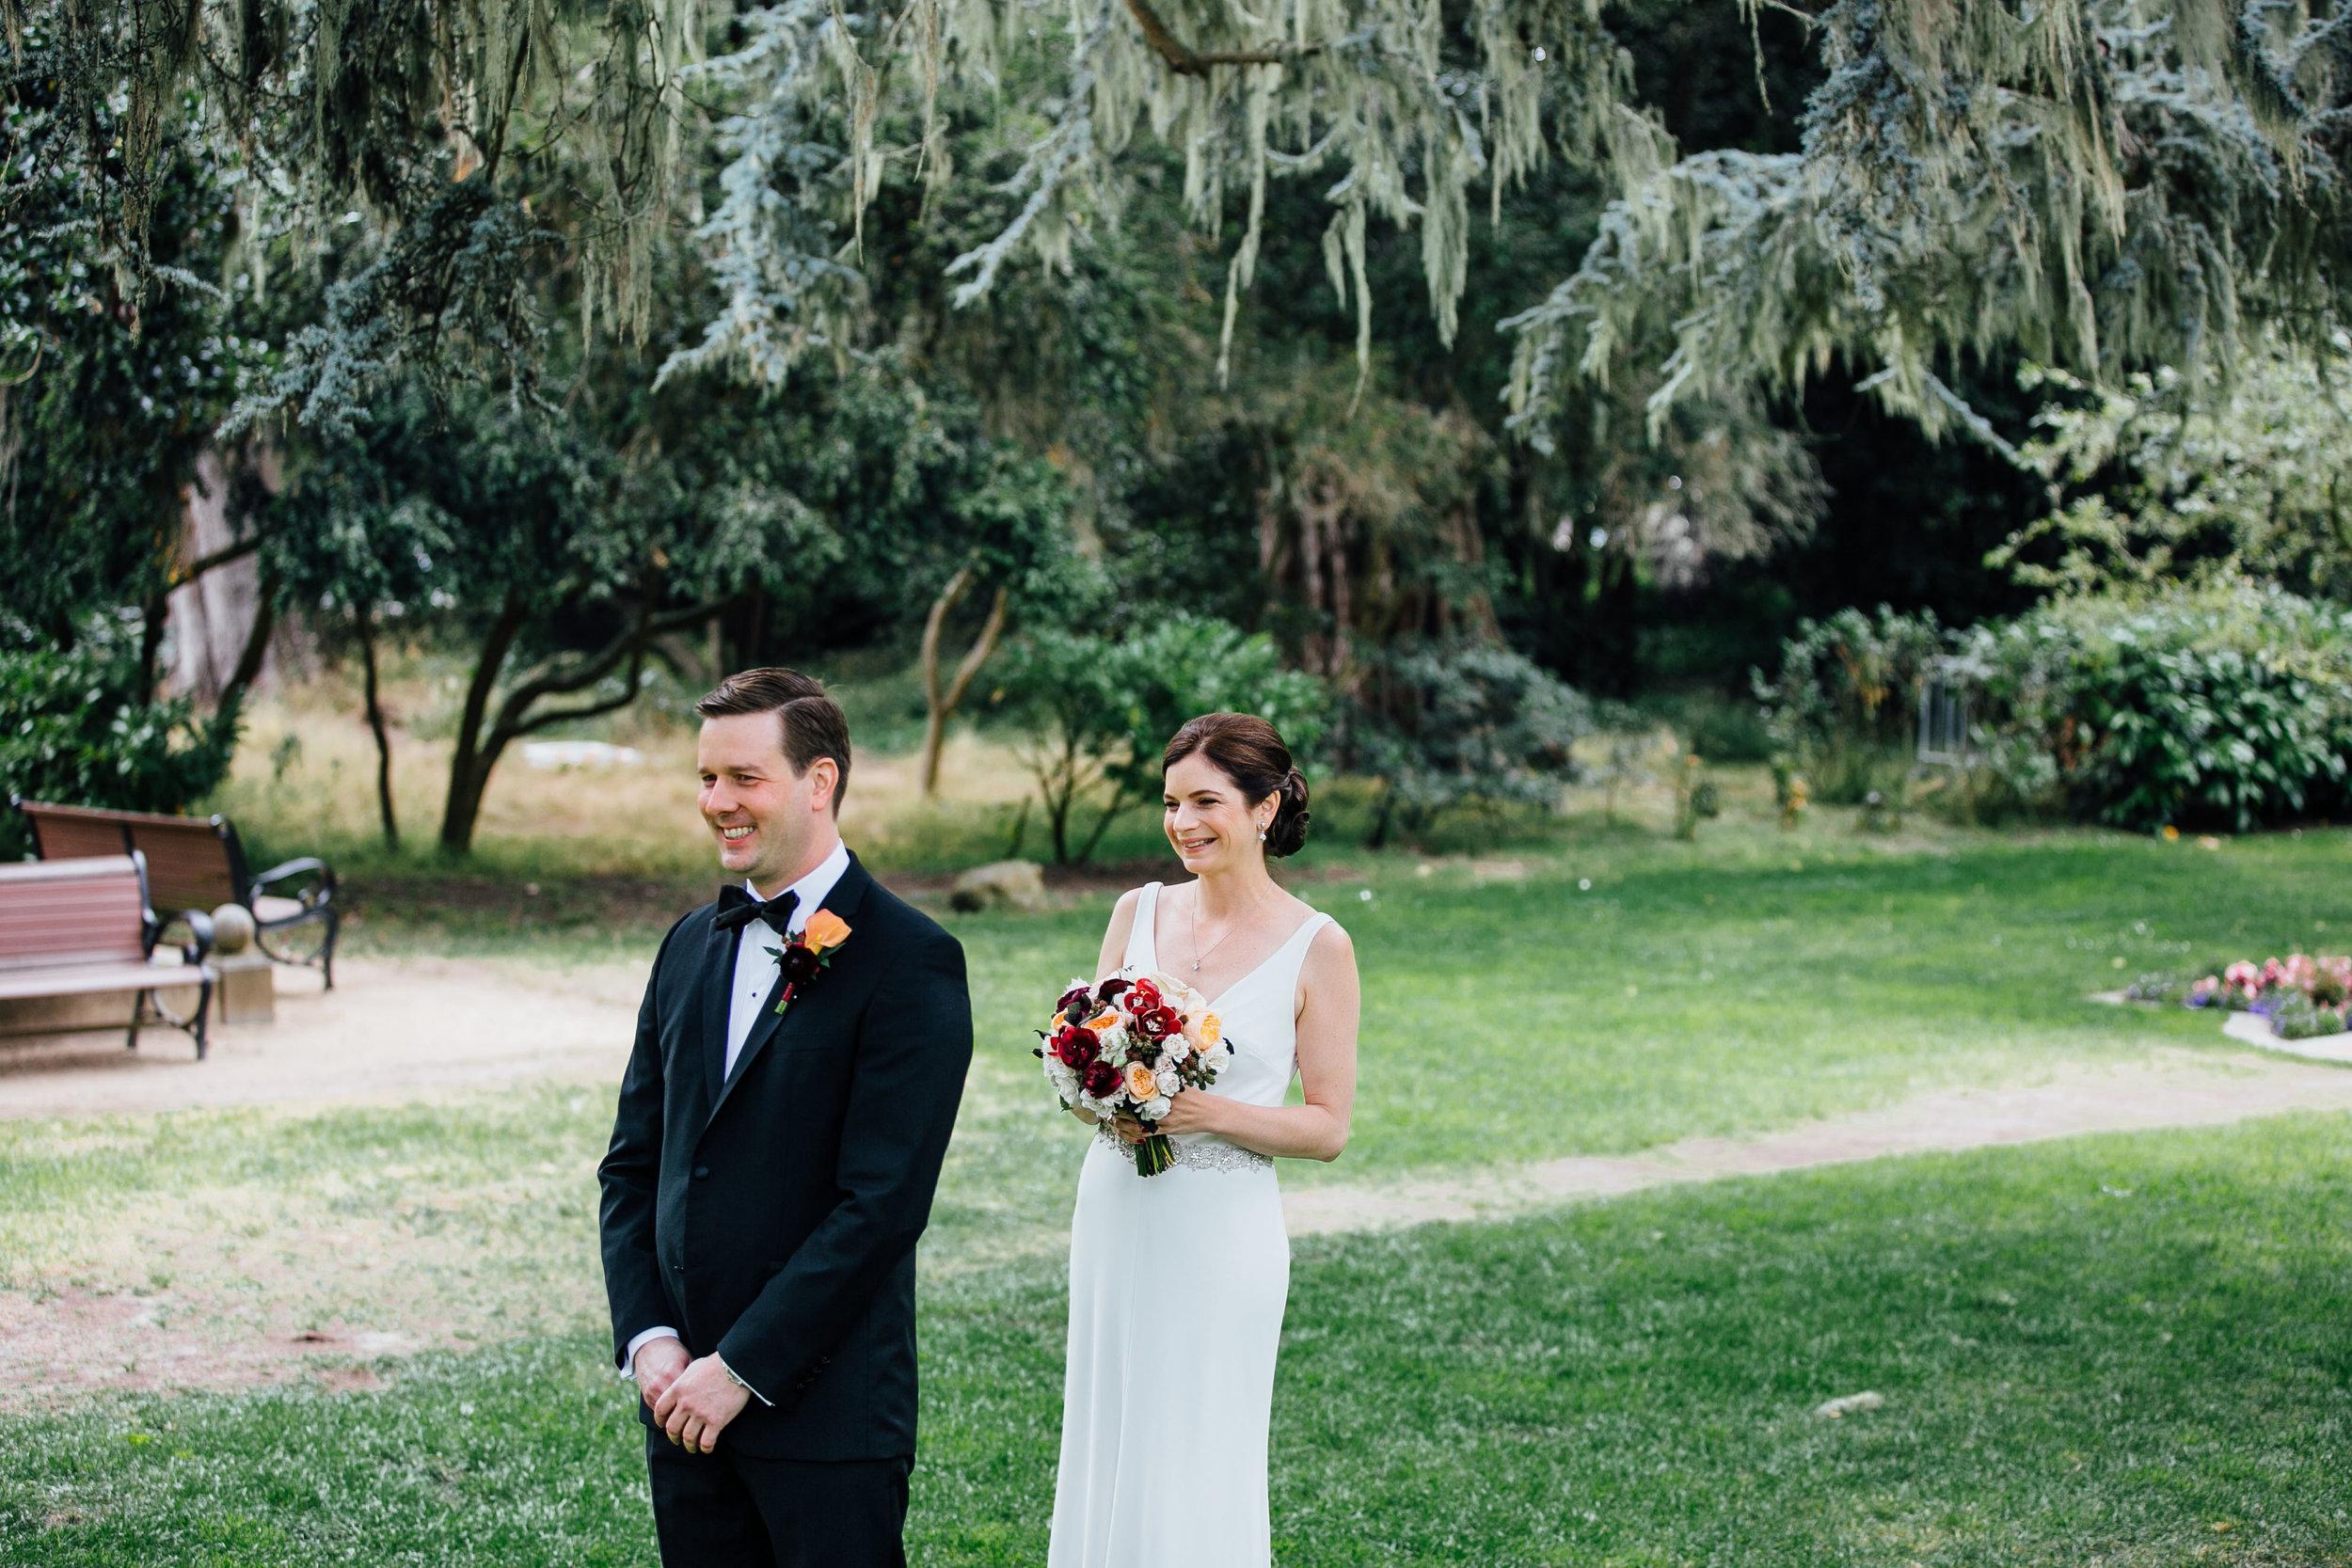 Wedding_KathleenMichael_BG_Portraits-156.jpg